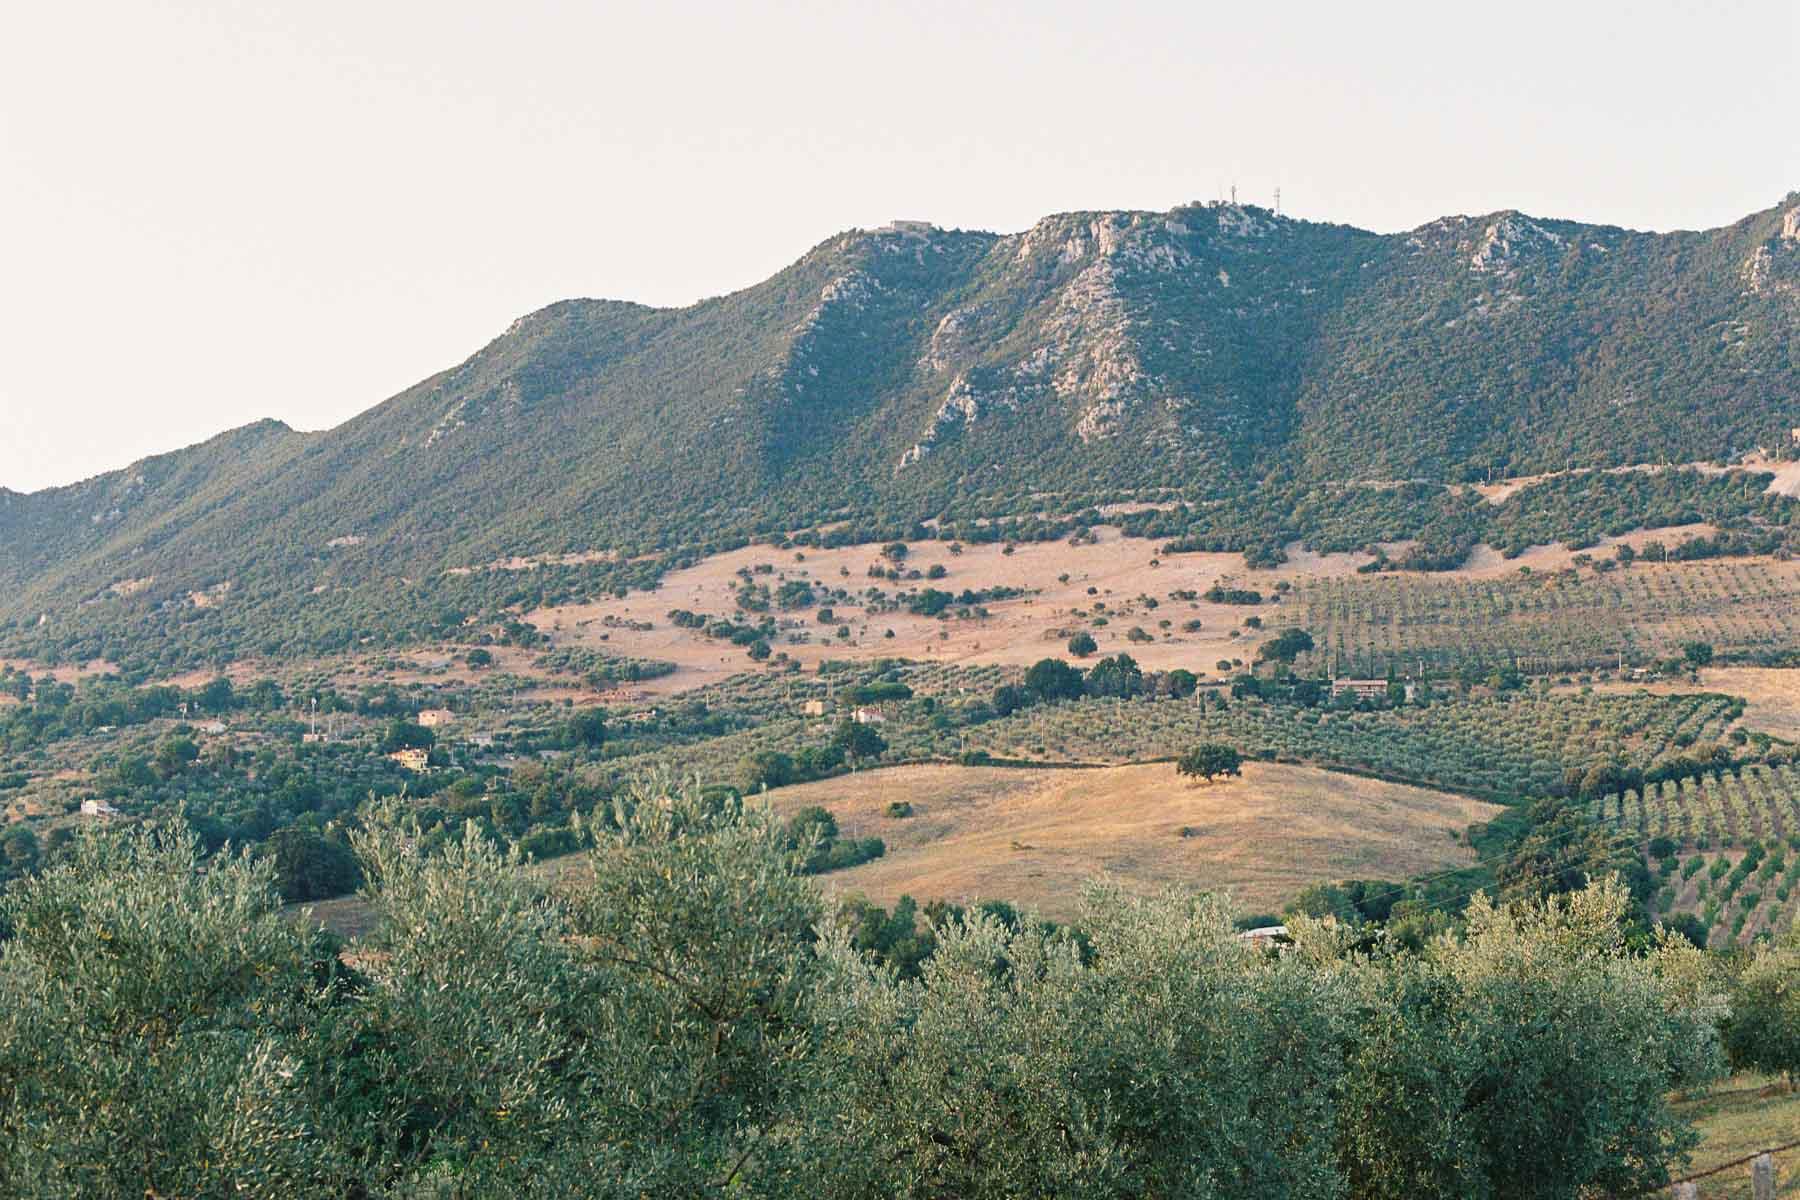 Blick auf den Monte Soratte, Lazio, Italien